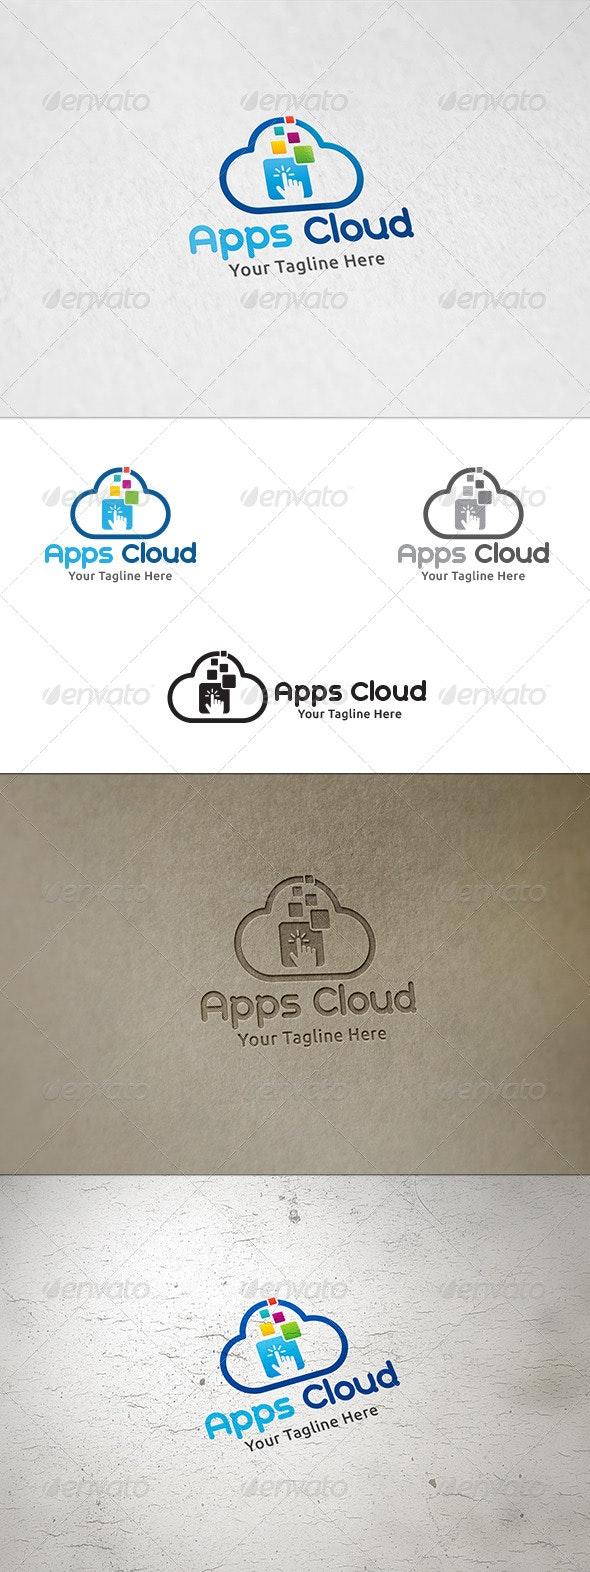 Apps Cloud - Logo Template - Symbols Logo Templates